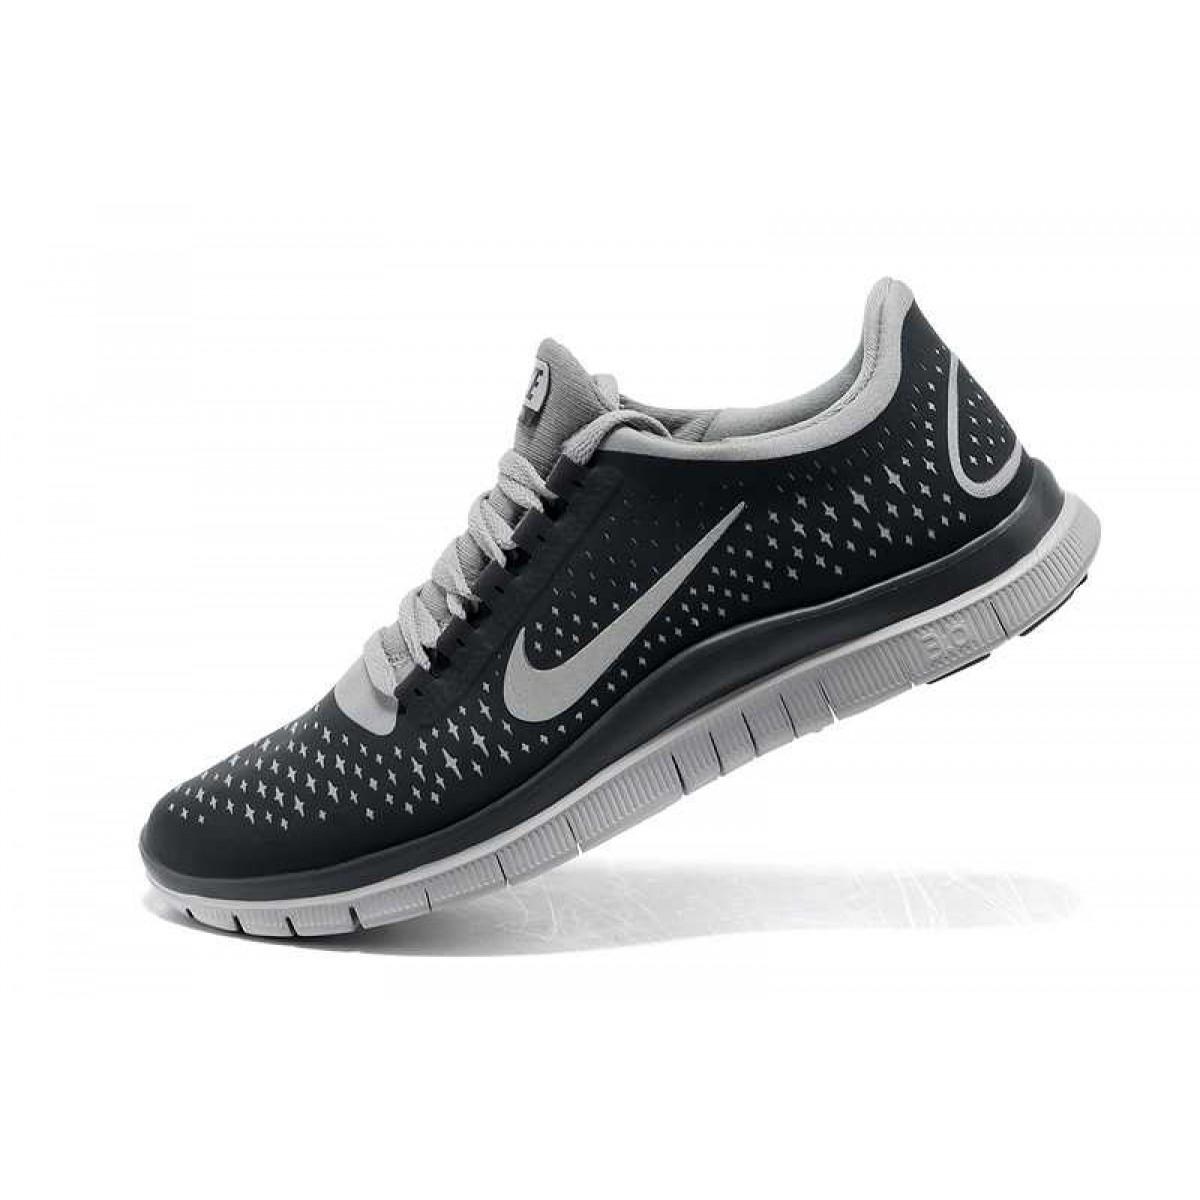 new arrival fd895 0b94c Homme Nike Free 3.0 V4 Chaussures Light Gris Blanc,nike free nike  elite,vente